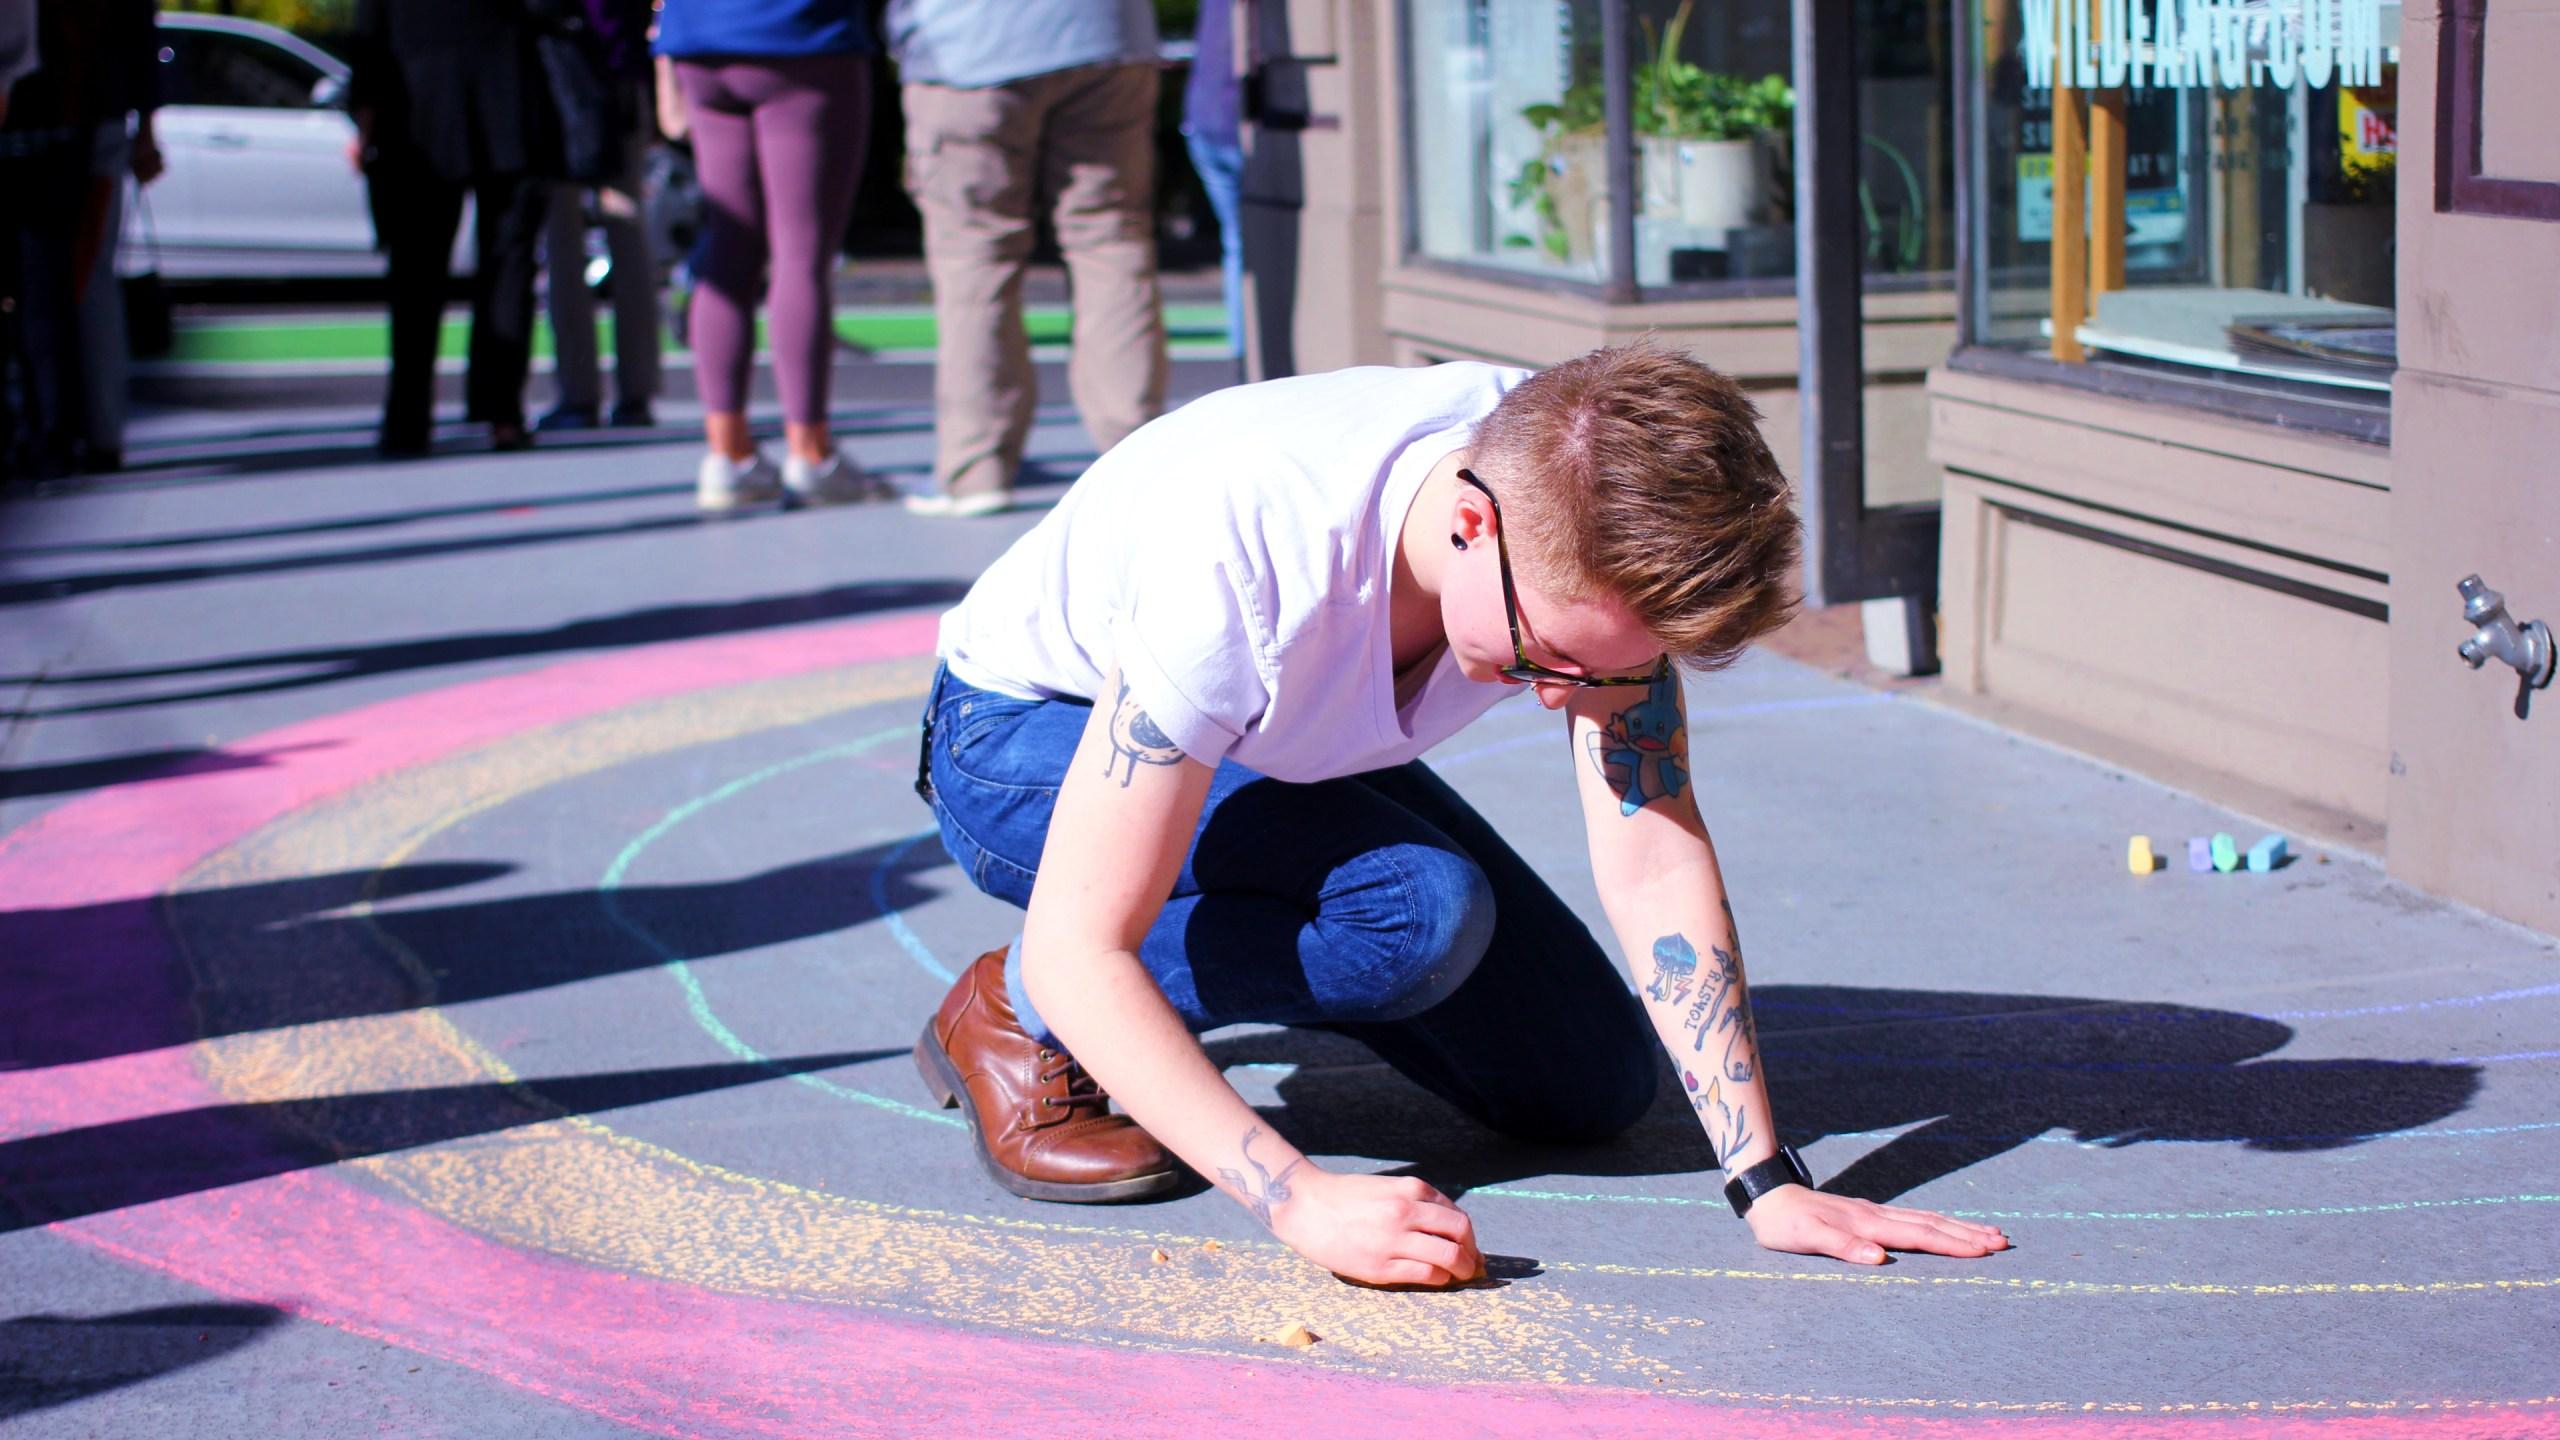 chalk artists draws rainbow on sidewalk